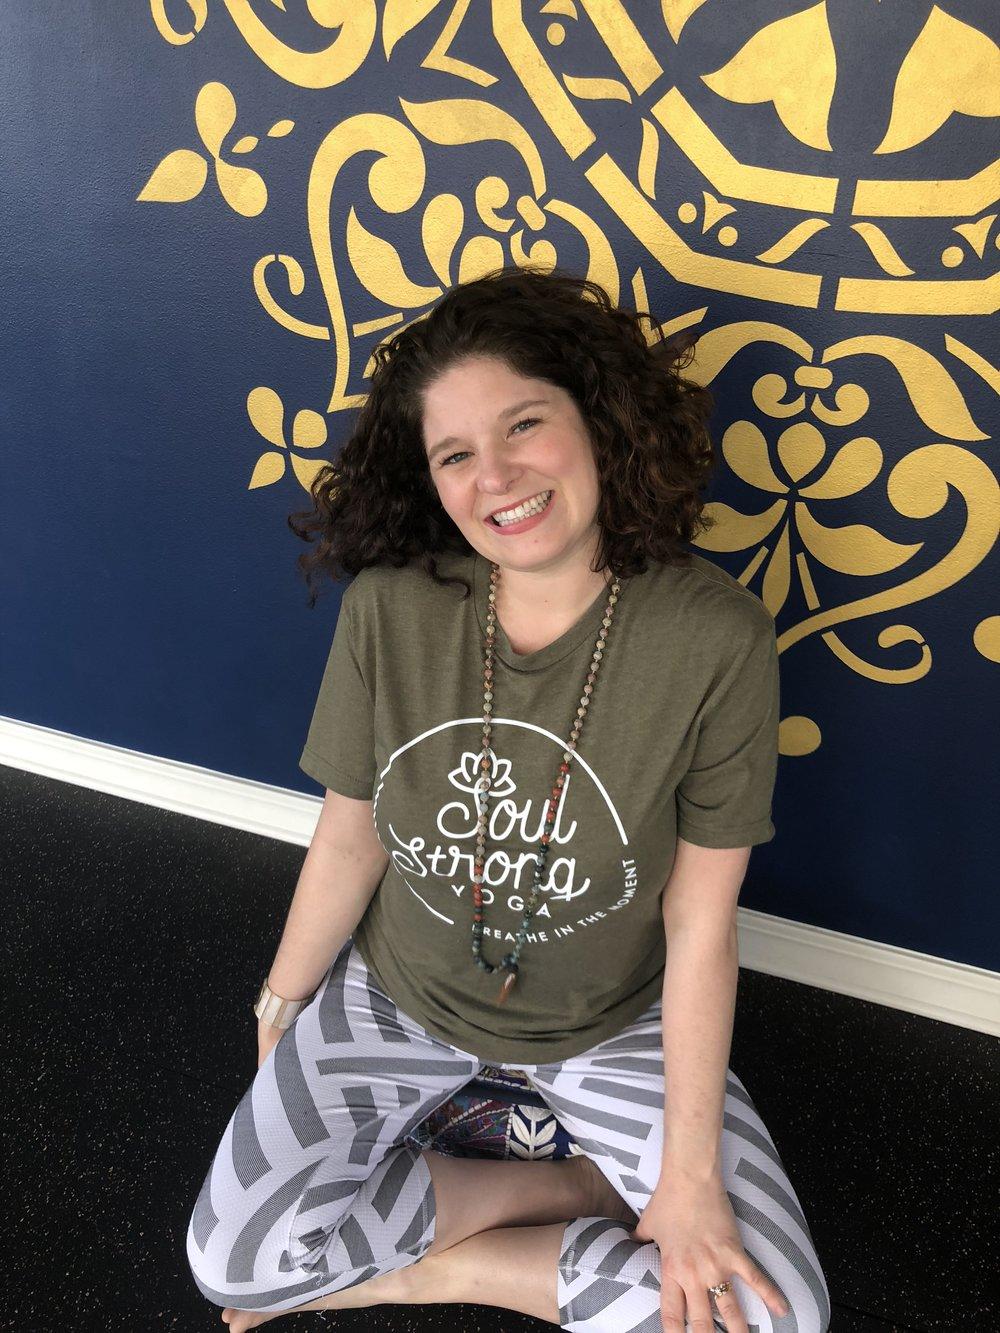 Beginners Series - Yoga for everyone! Beginners Series with Julie.